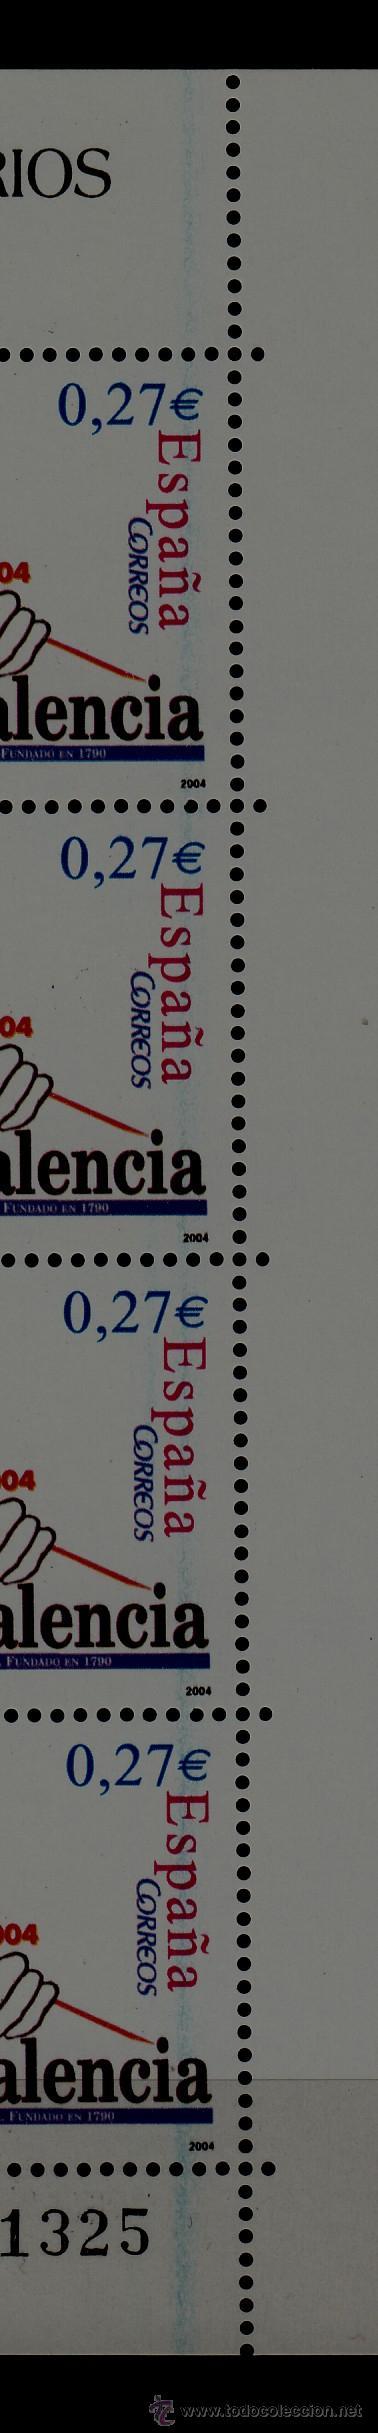 Sellos: españa 4094 minipliego 85 sin charnela, vdad linea azul en 4 sellos derecha, prensa diario valencia+ - Foto 2 - 50141477